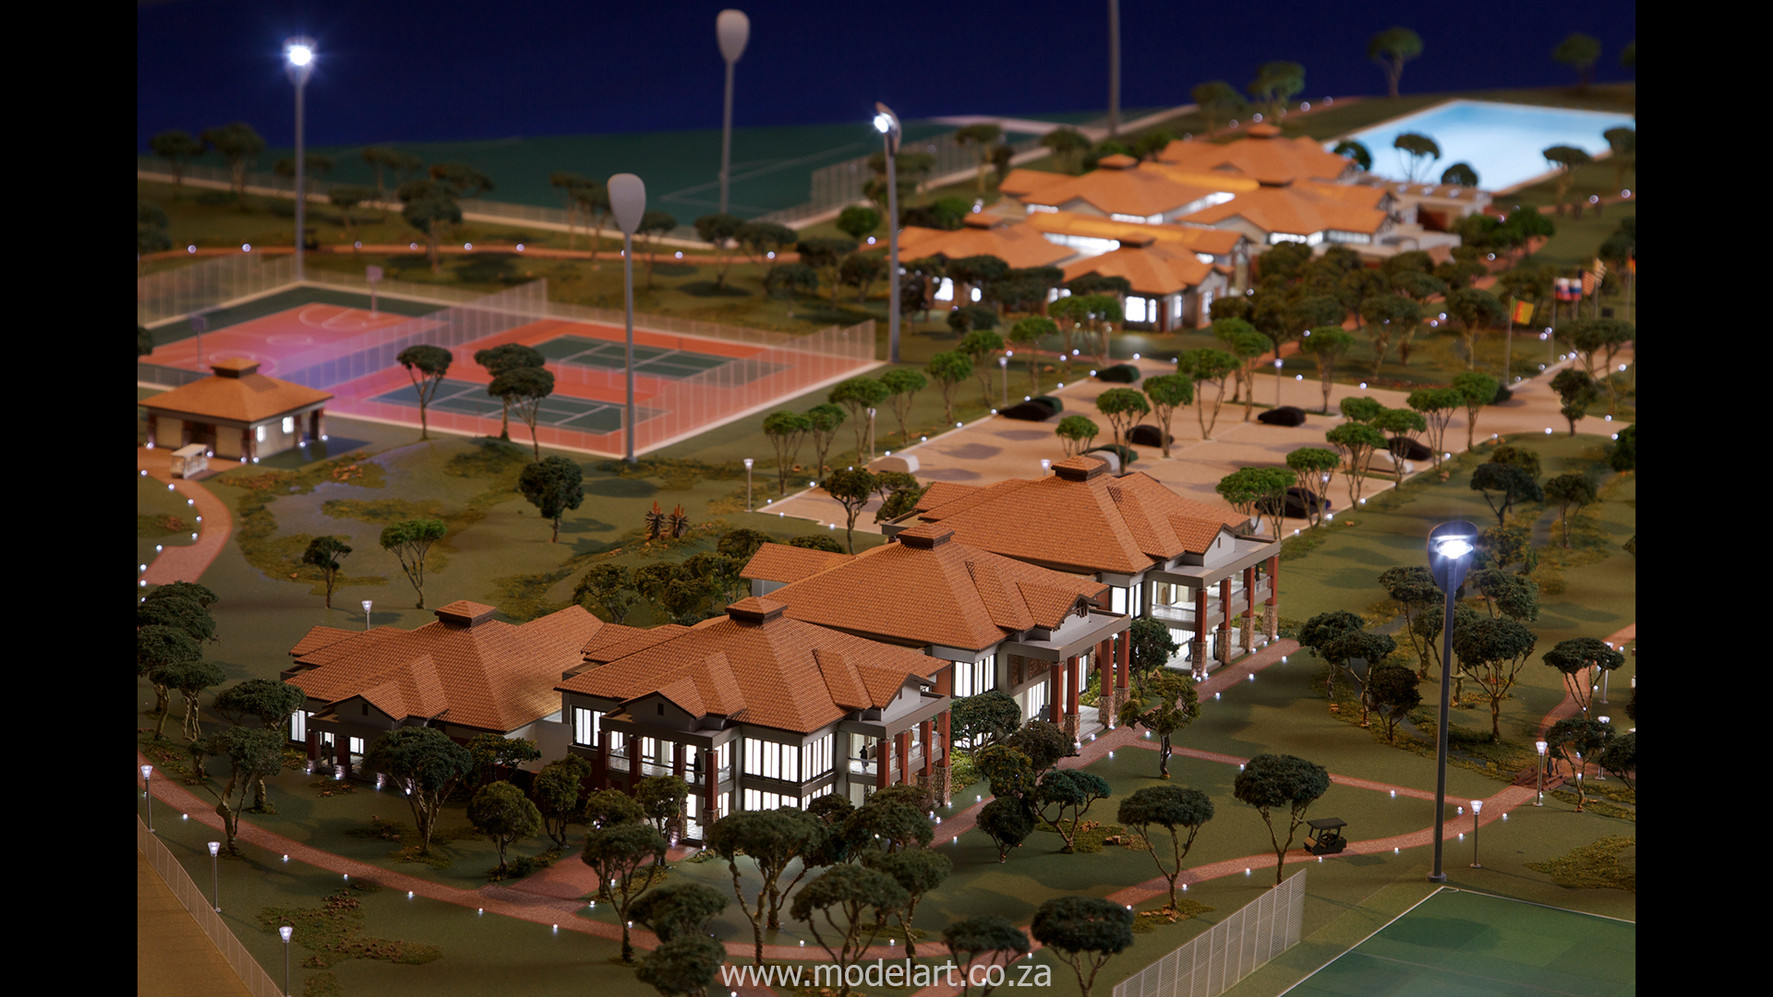 Architectural-Scale-Model-Sports Facilities-Royal Bafokeng Campus 2-3